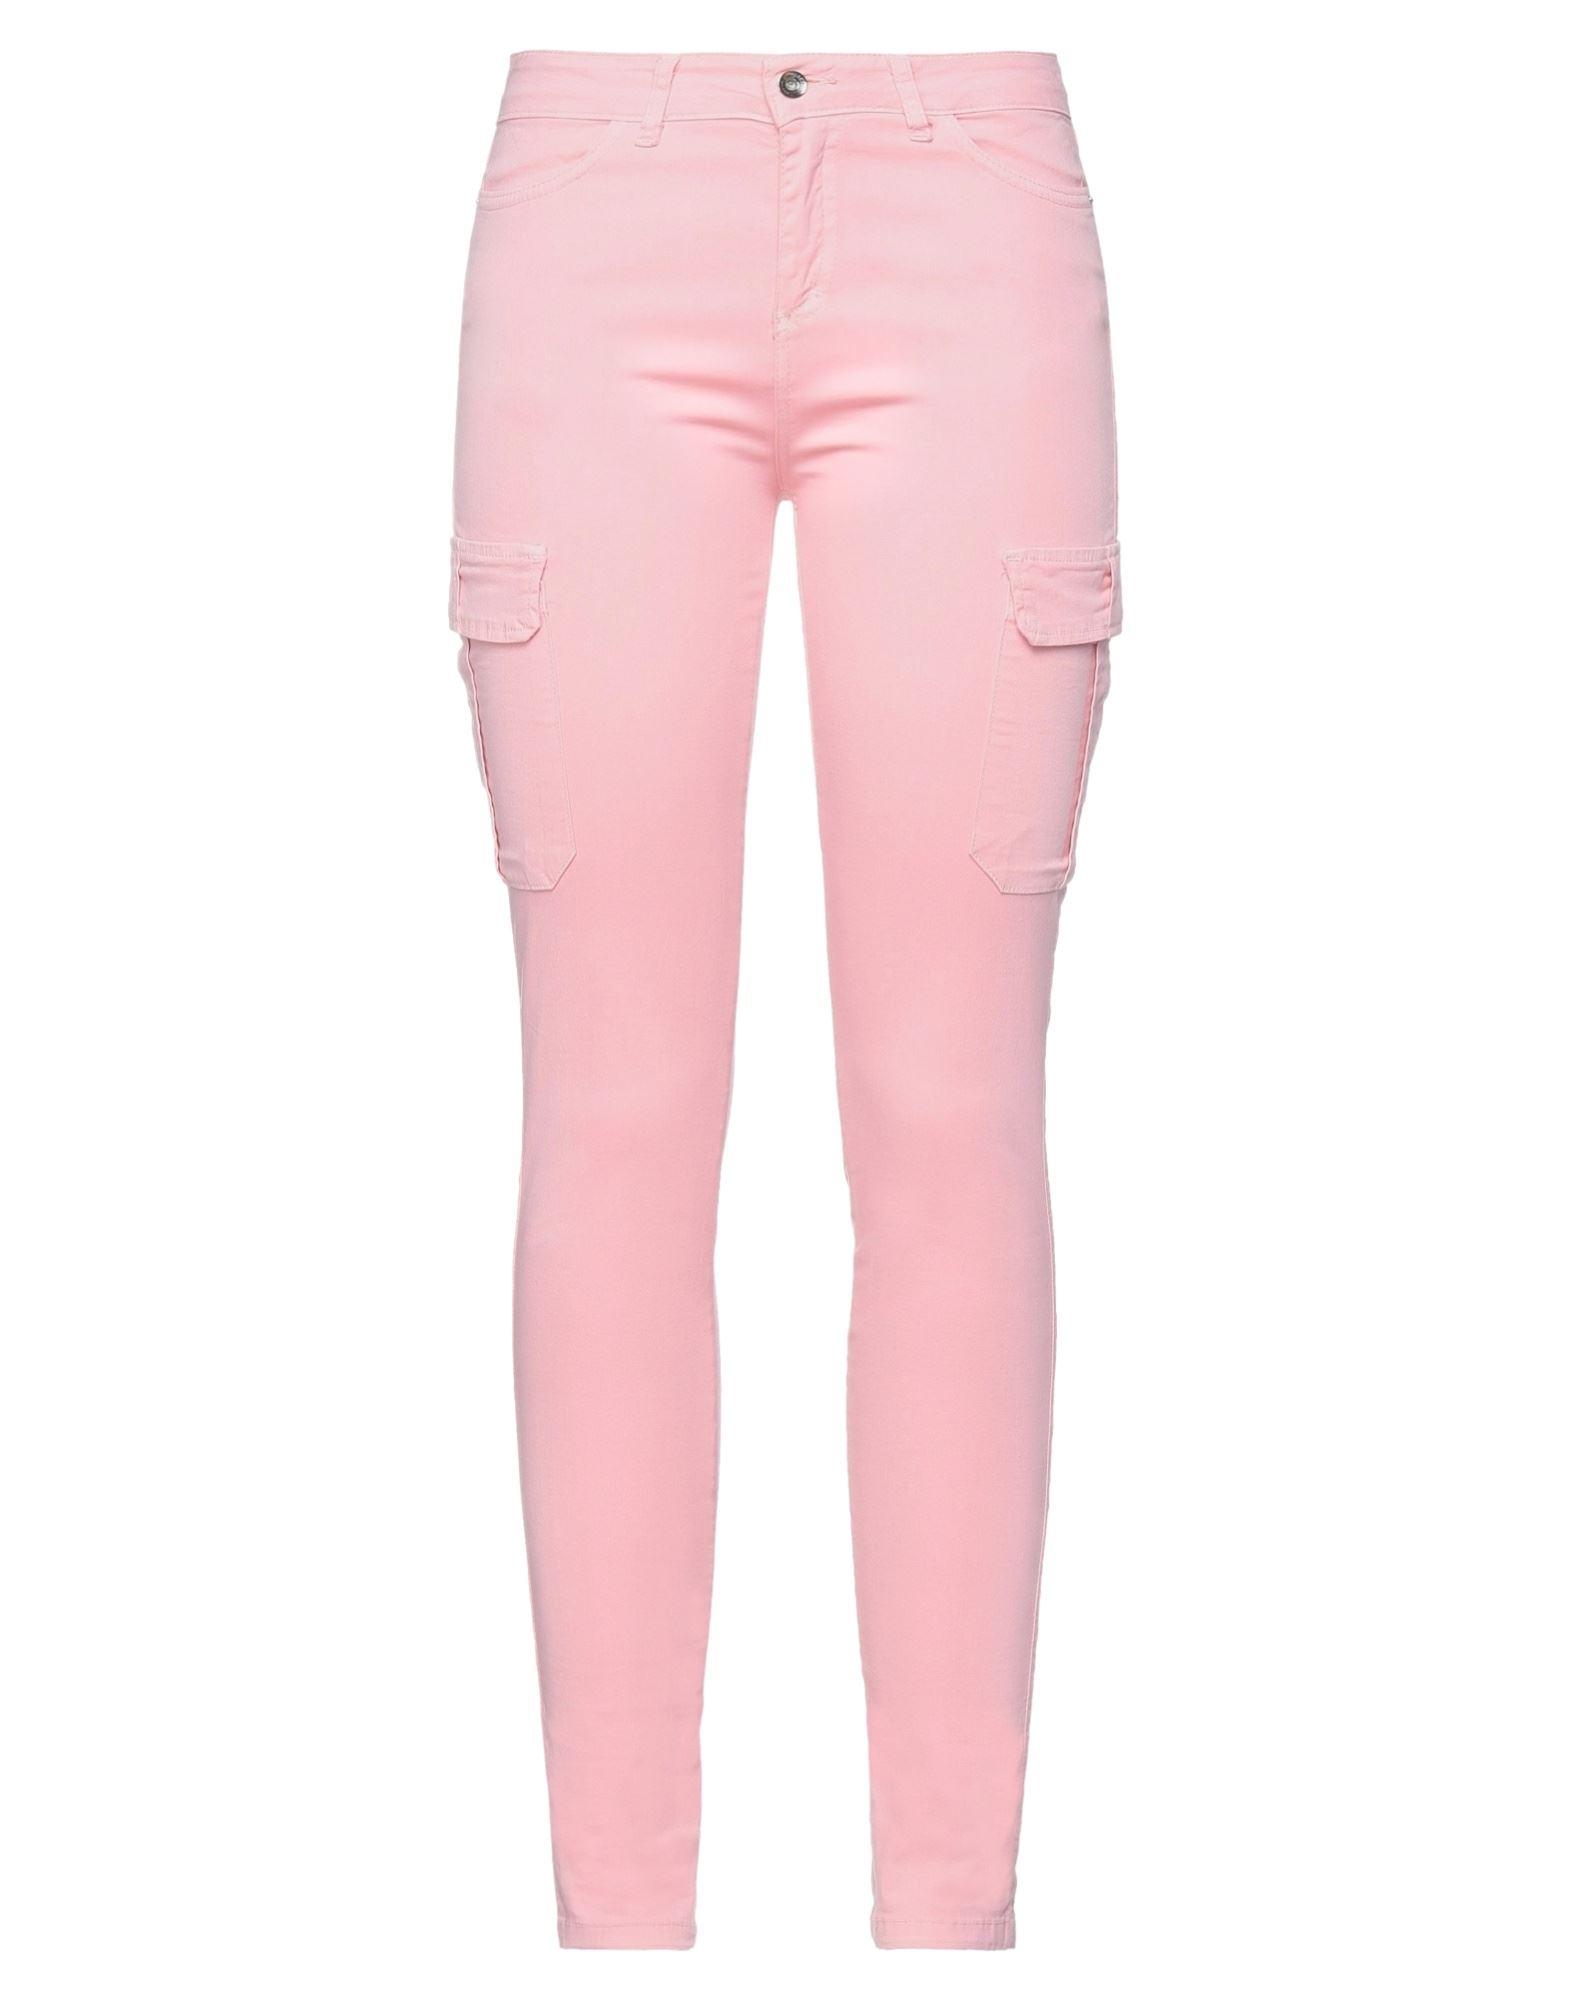 gretha milano блузка GRETHA Milano Повседневные брюки